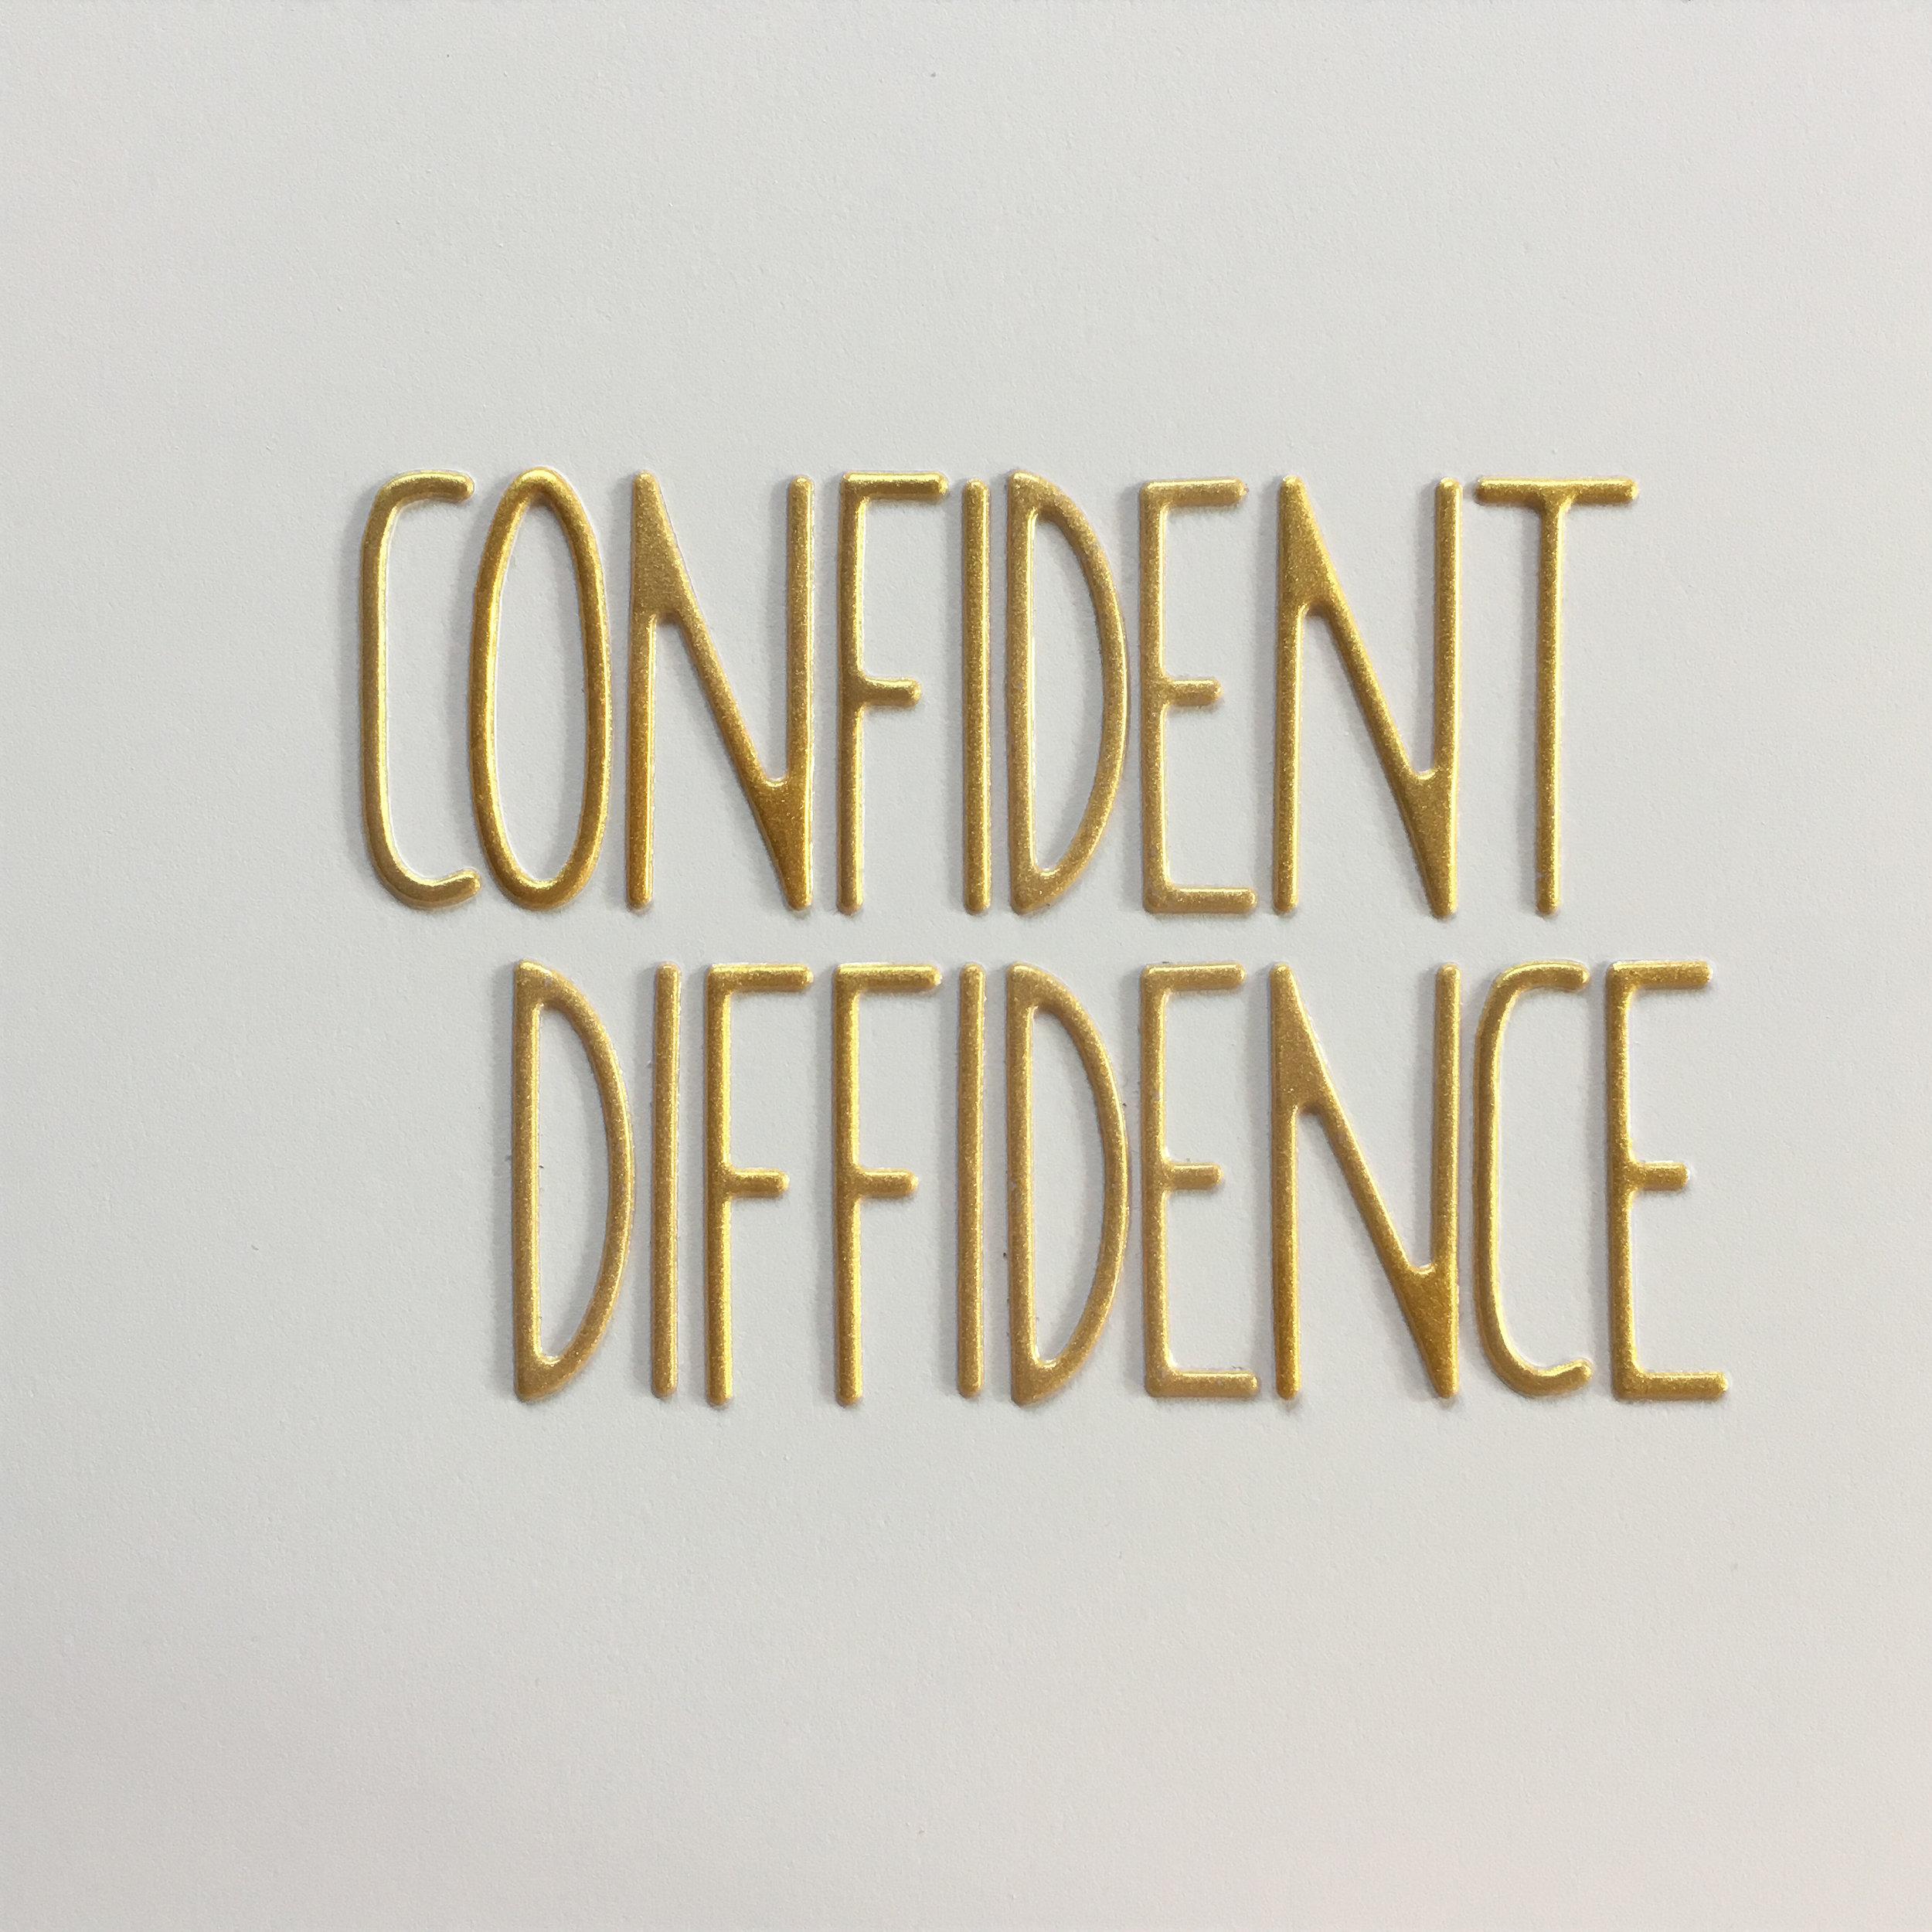 confident diffidence.jpg